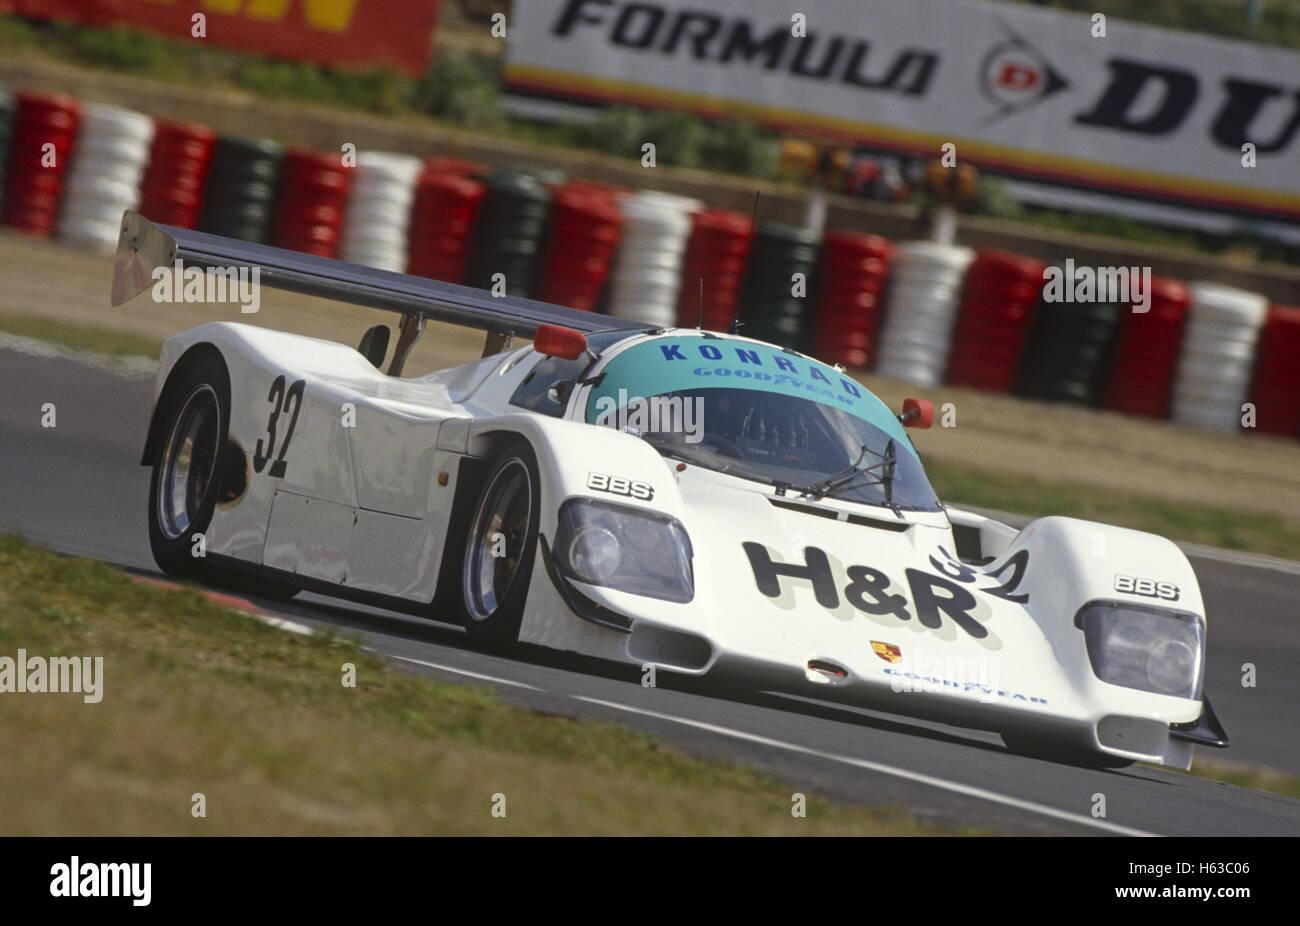 1990 Franz Konradu0027s Porsche 962 World Sports Car Championship Car   Stock  Image